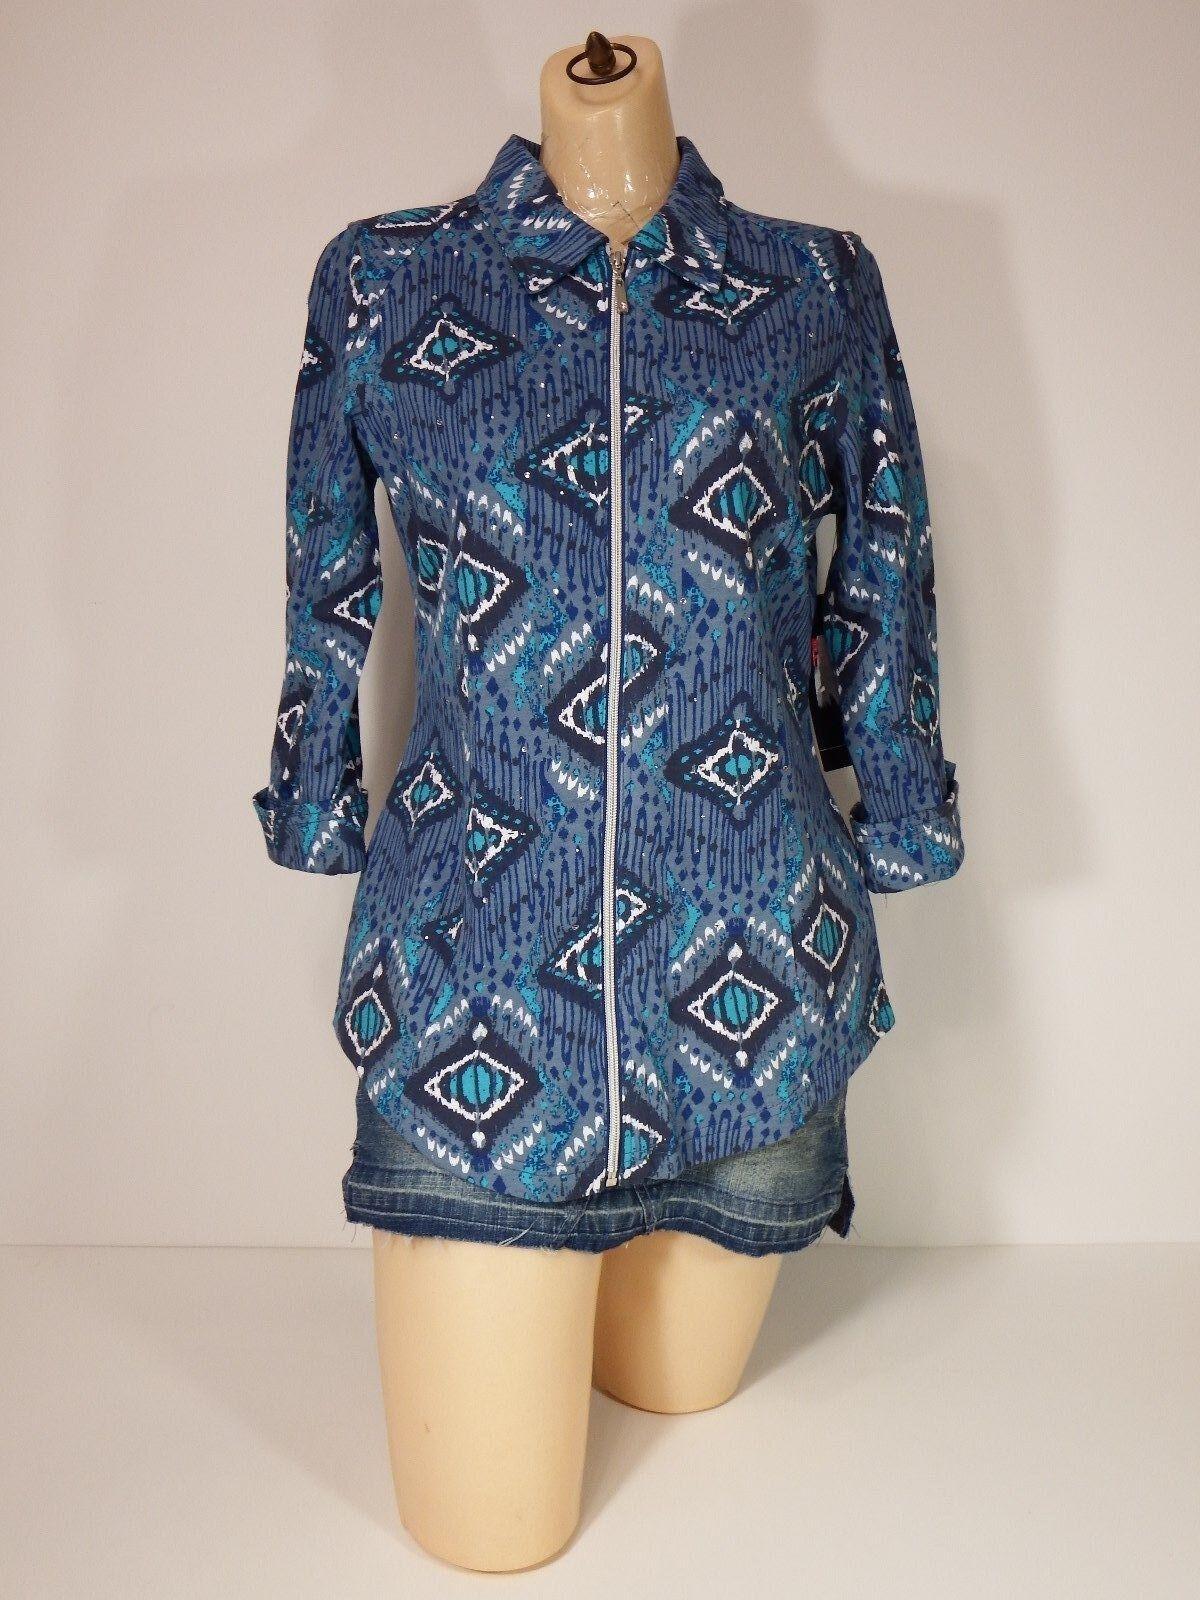 Shirt Top small Three Hearts Rhinestone Zip Up 3 4 Sleeve bluee  Juniors  Small S